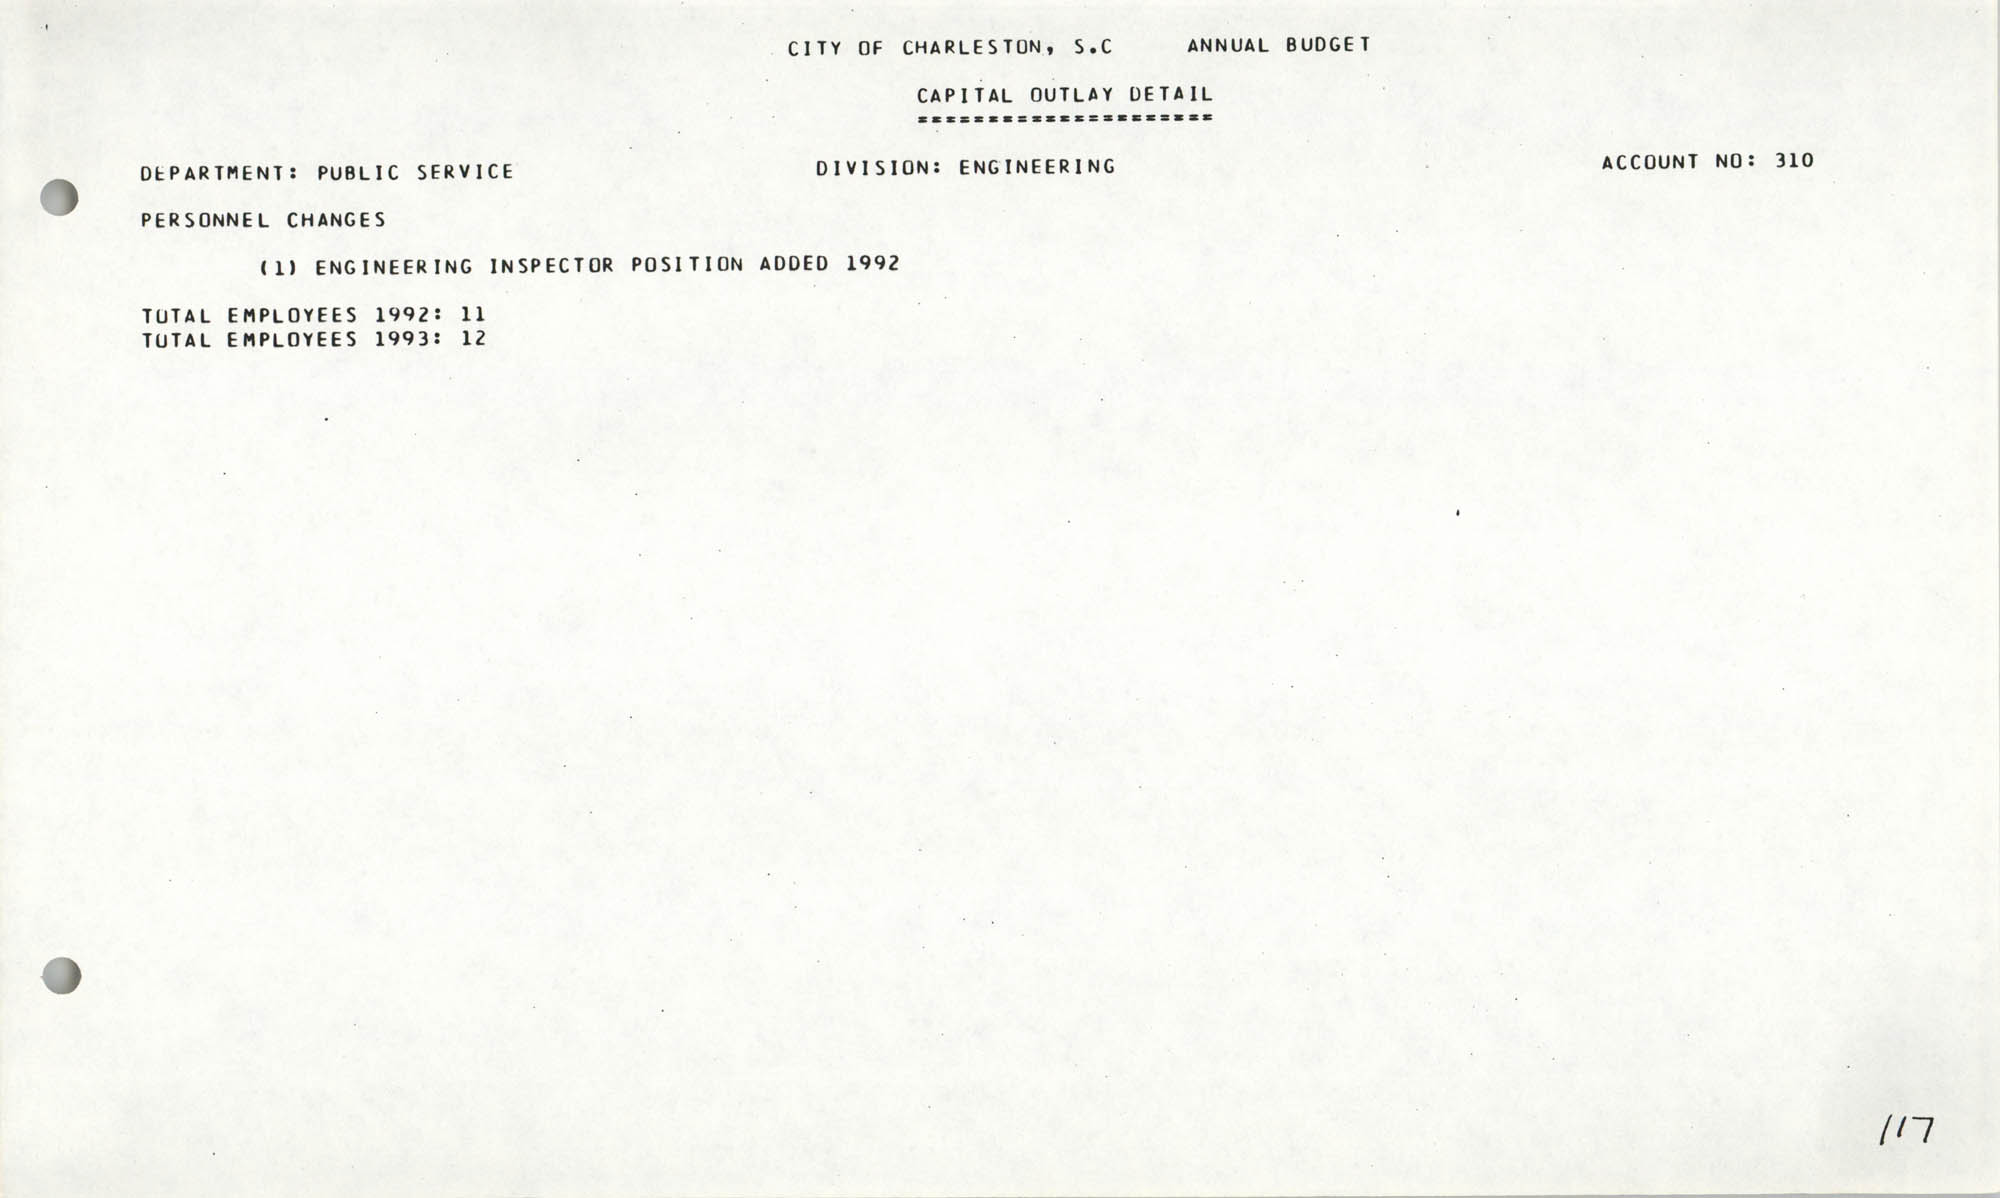 The City Council of Charleston, South Carolina, 1993 Budget, Page 117